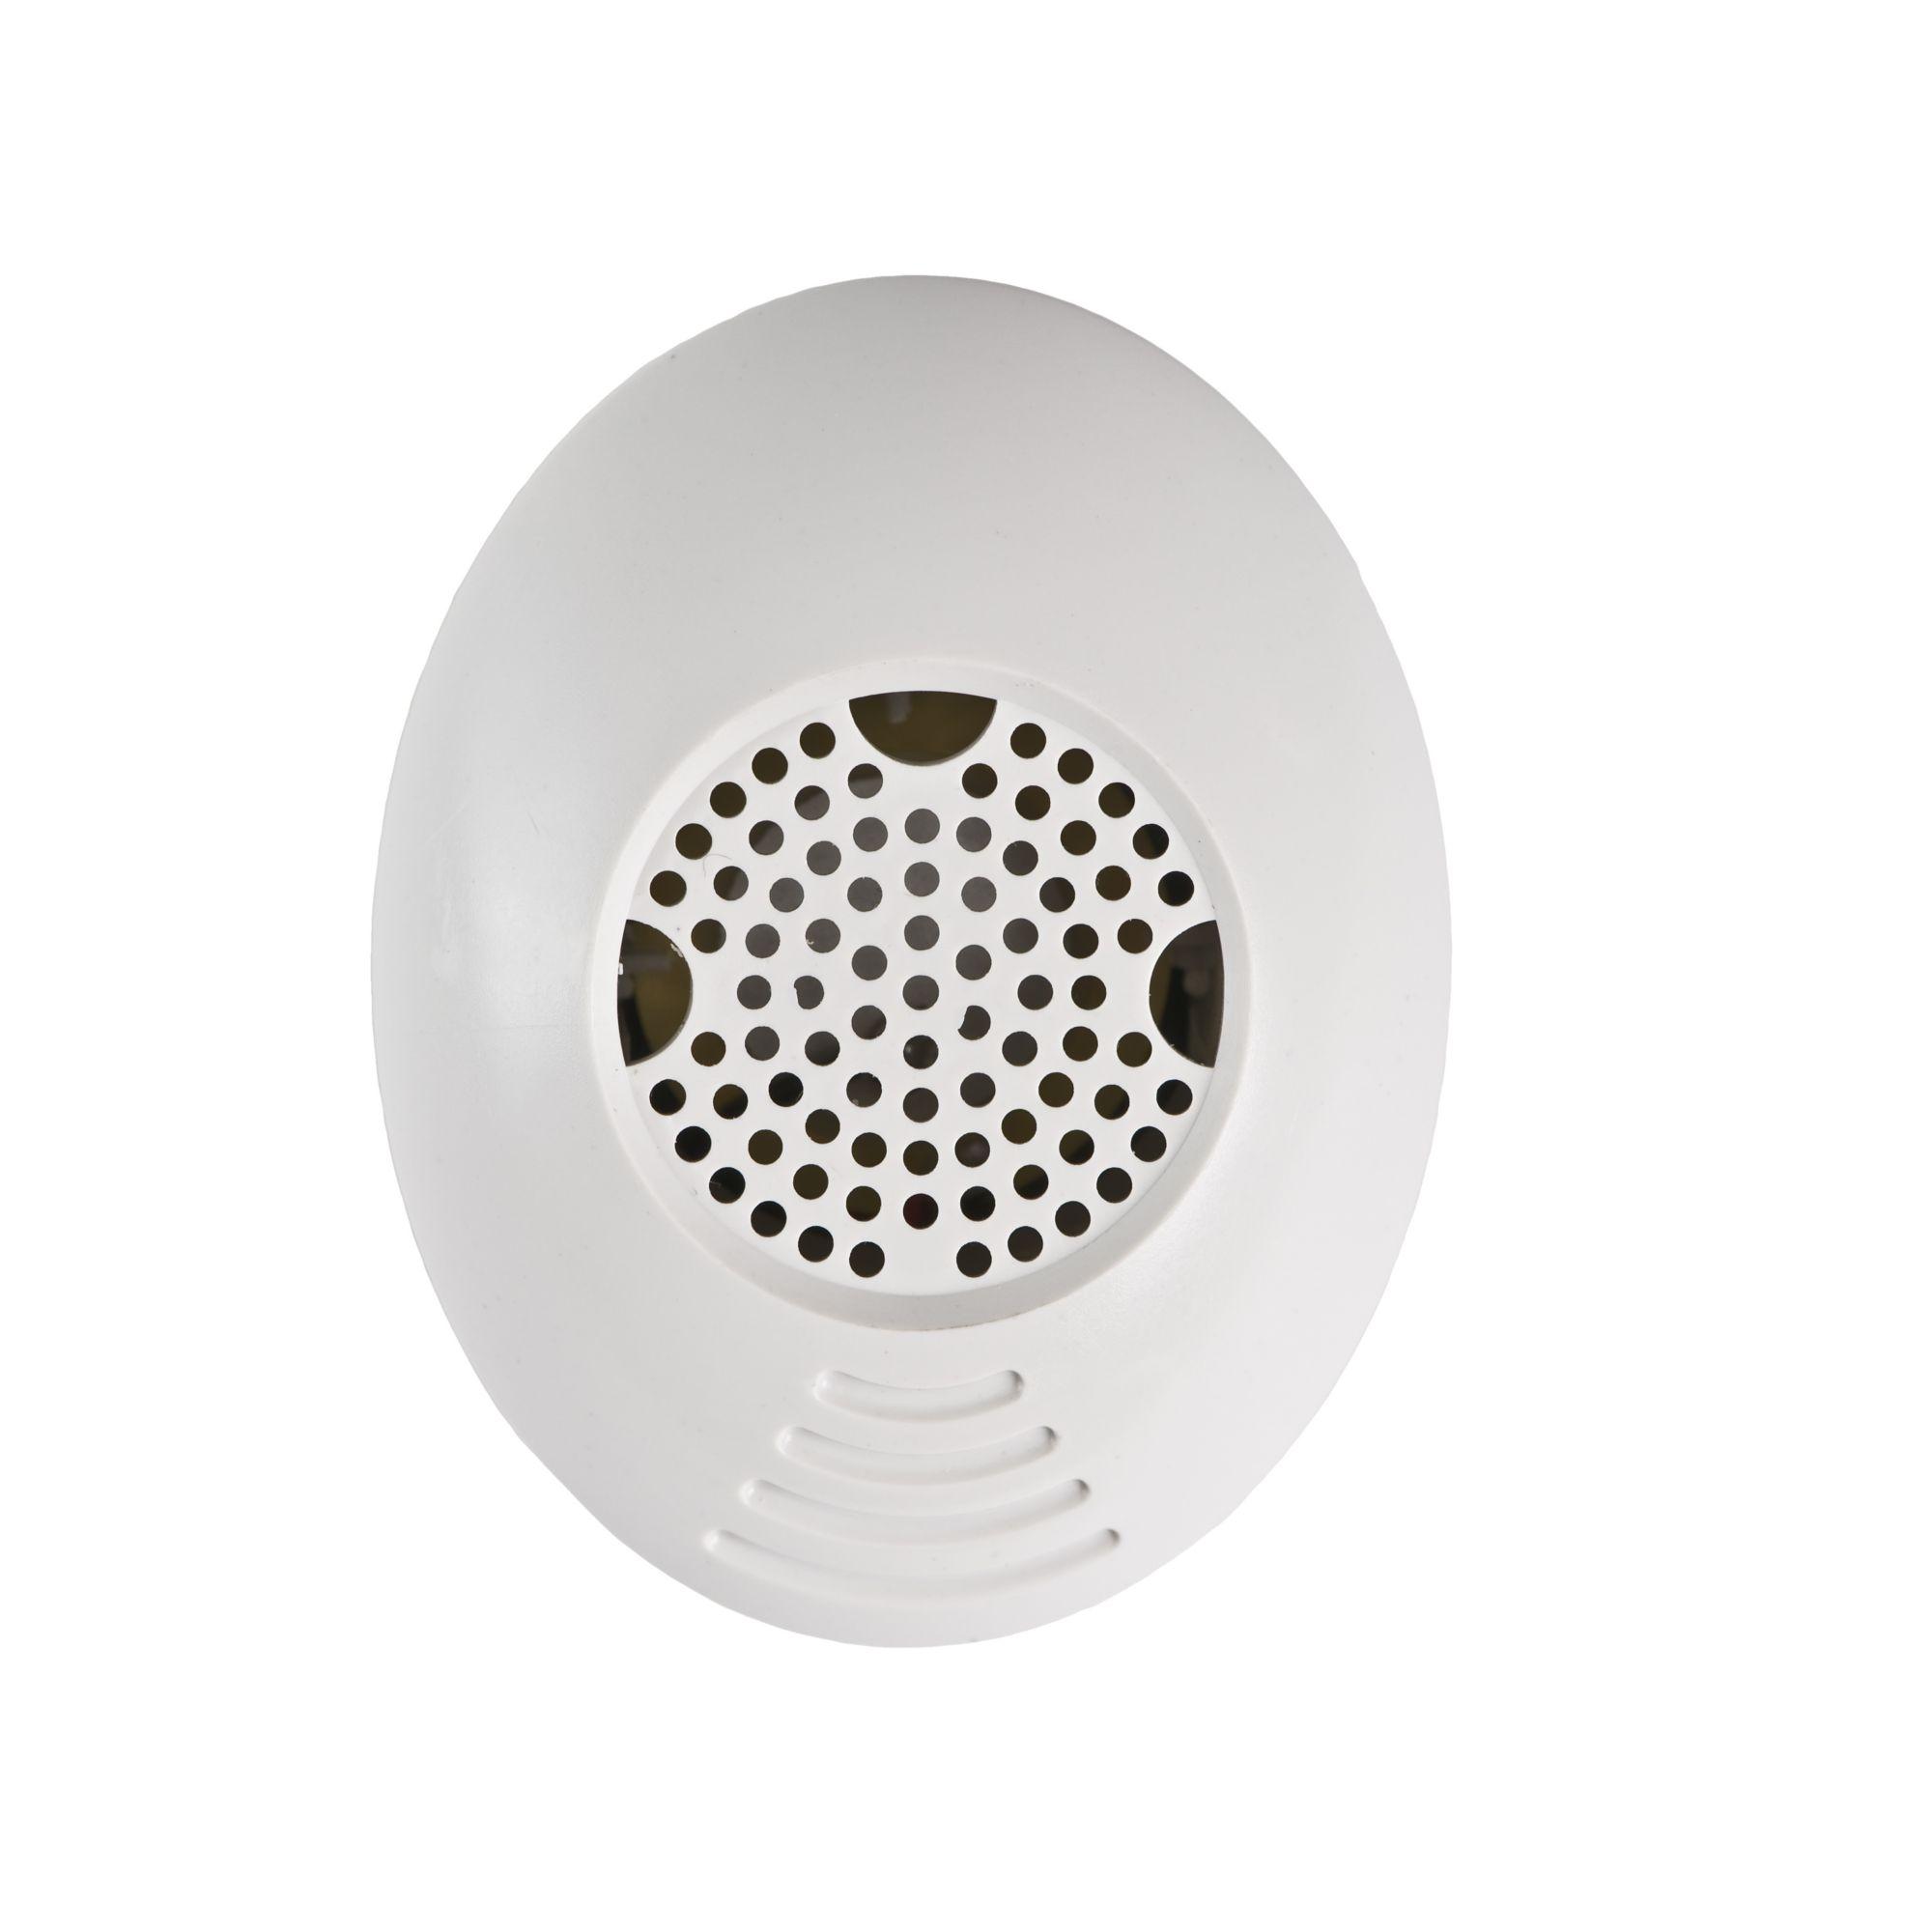 Victor® Mini Pestchaser Ultrasonic with Nightlight | M753SN | VictorPest com